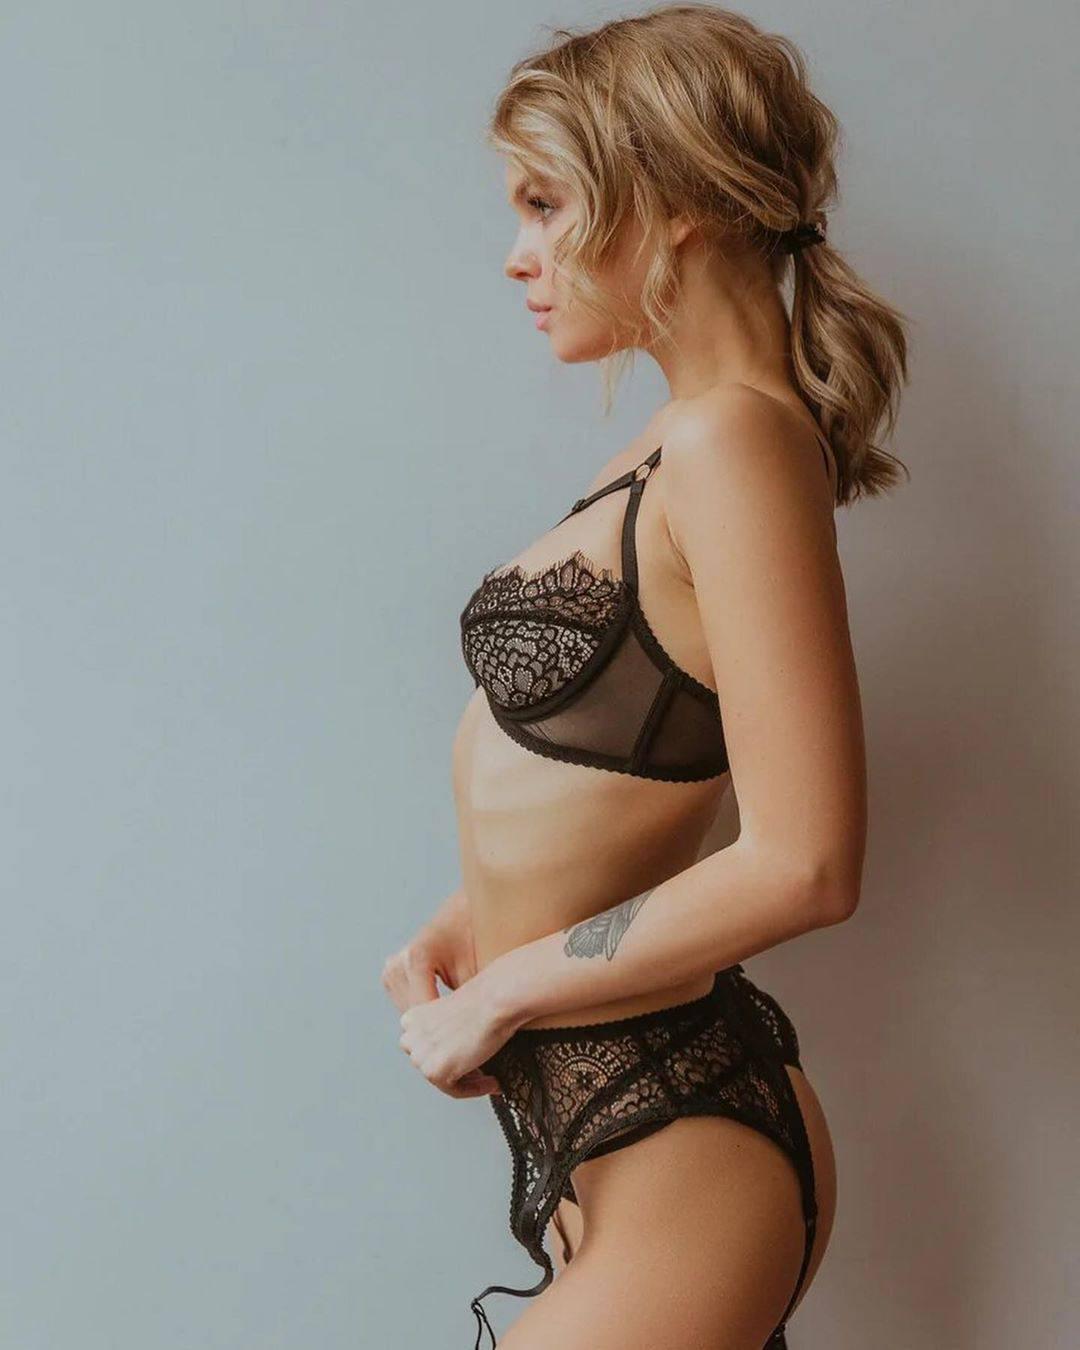 Anastasia Shcheglova Sexy In Black Lingerie